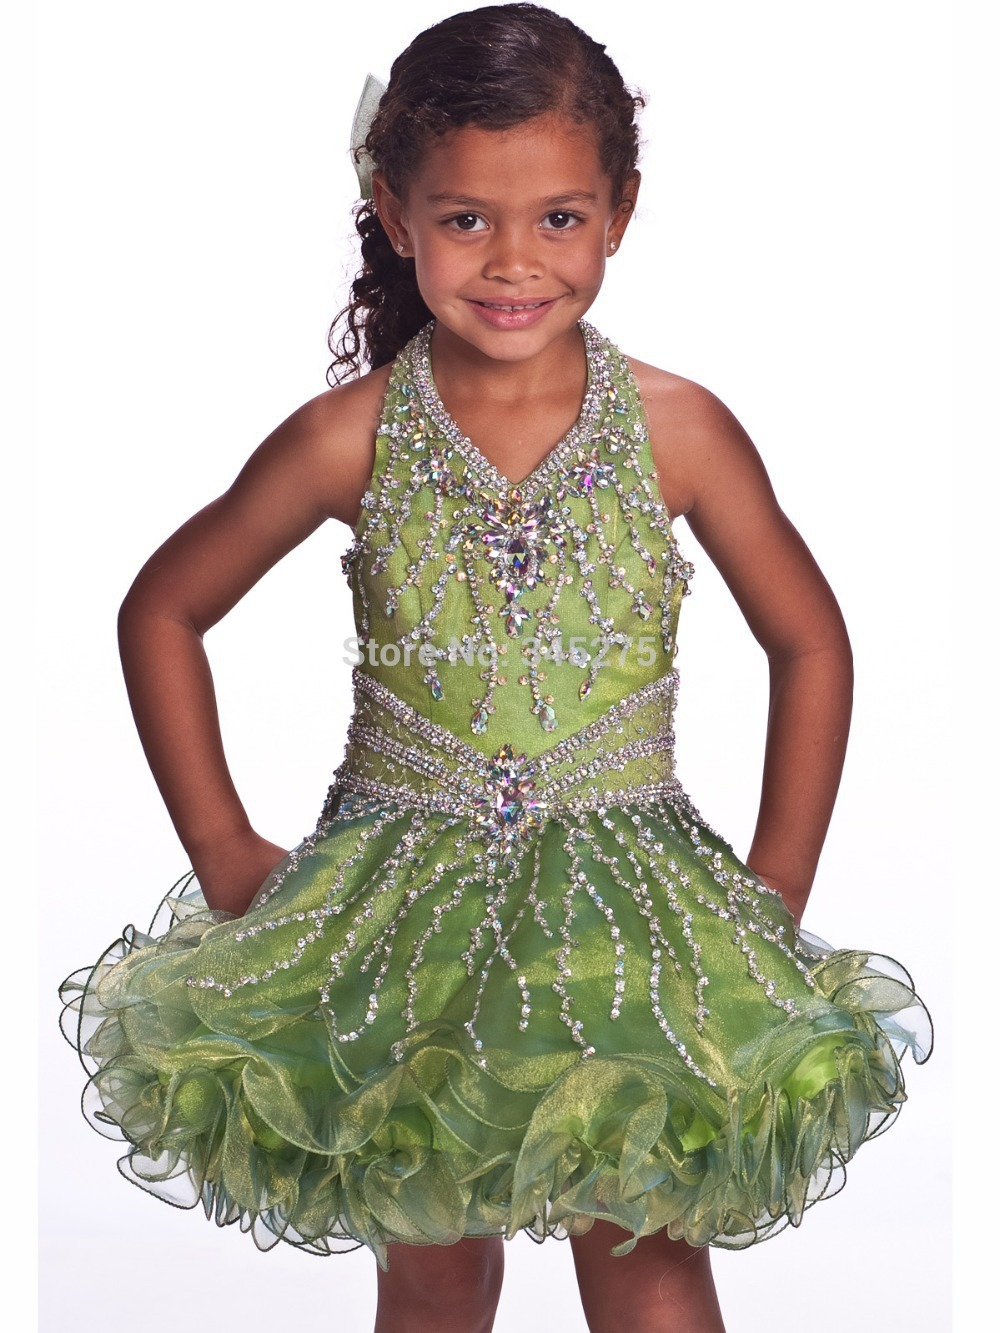 Cheap Glitz Cupcake Pageant Dresses, find Glitz Cupcake Pageant ...